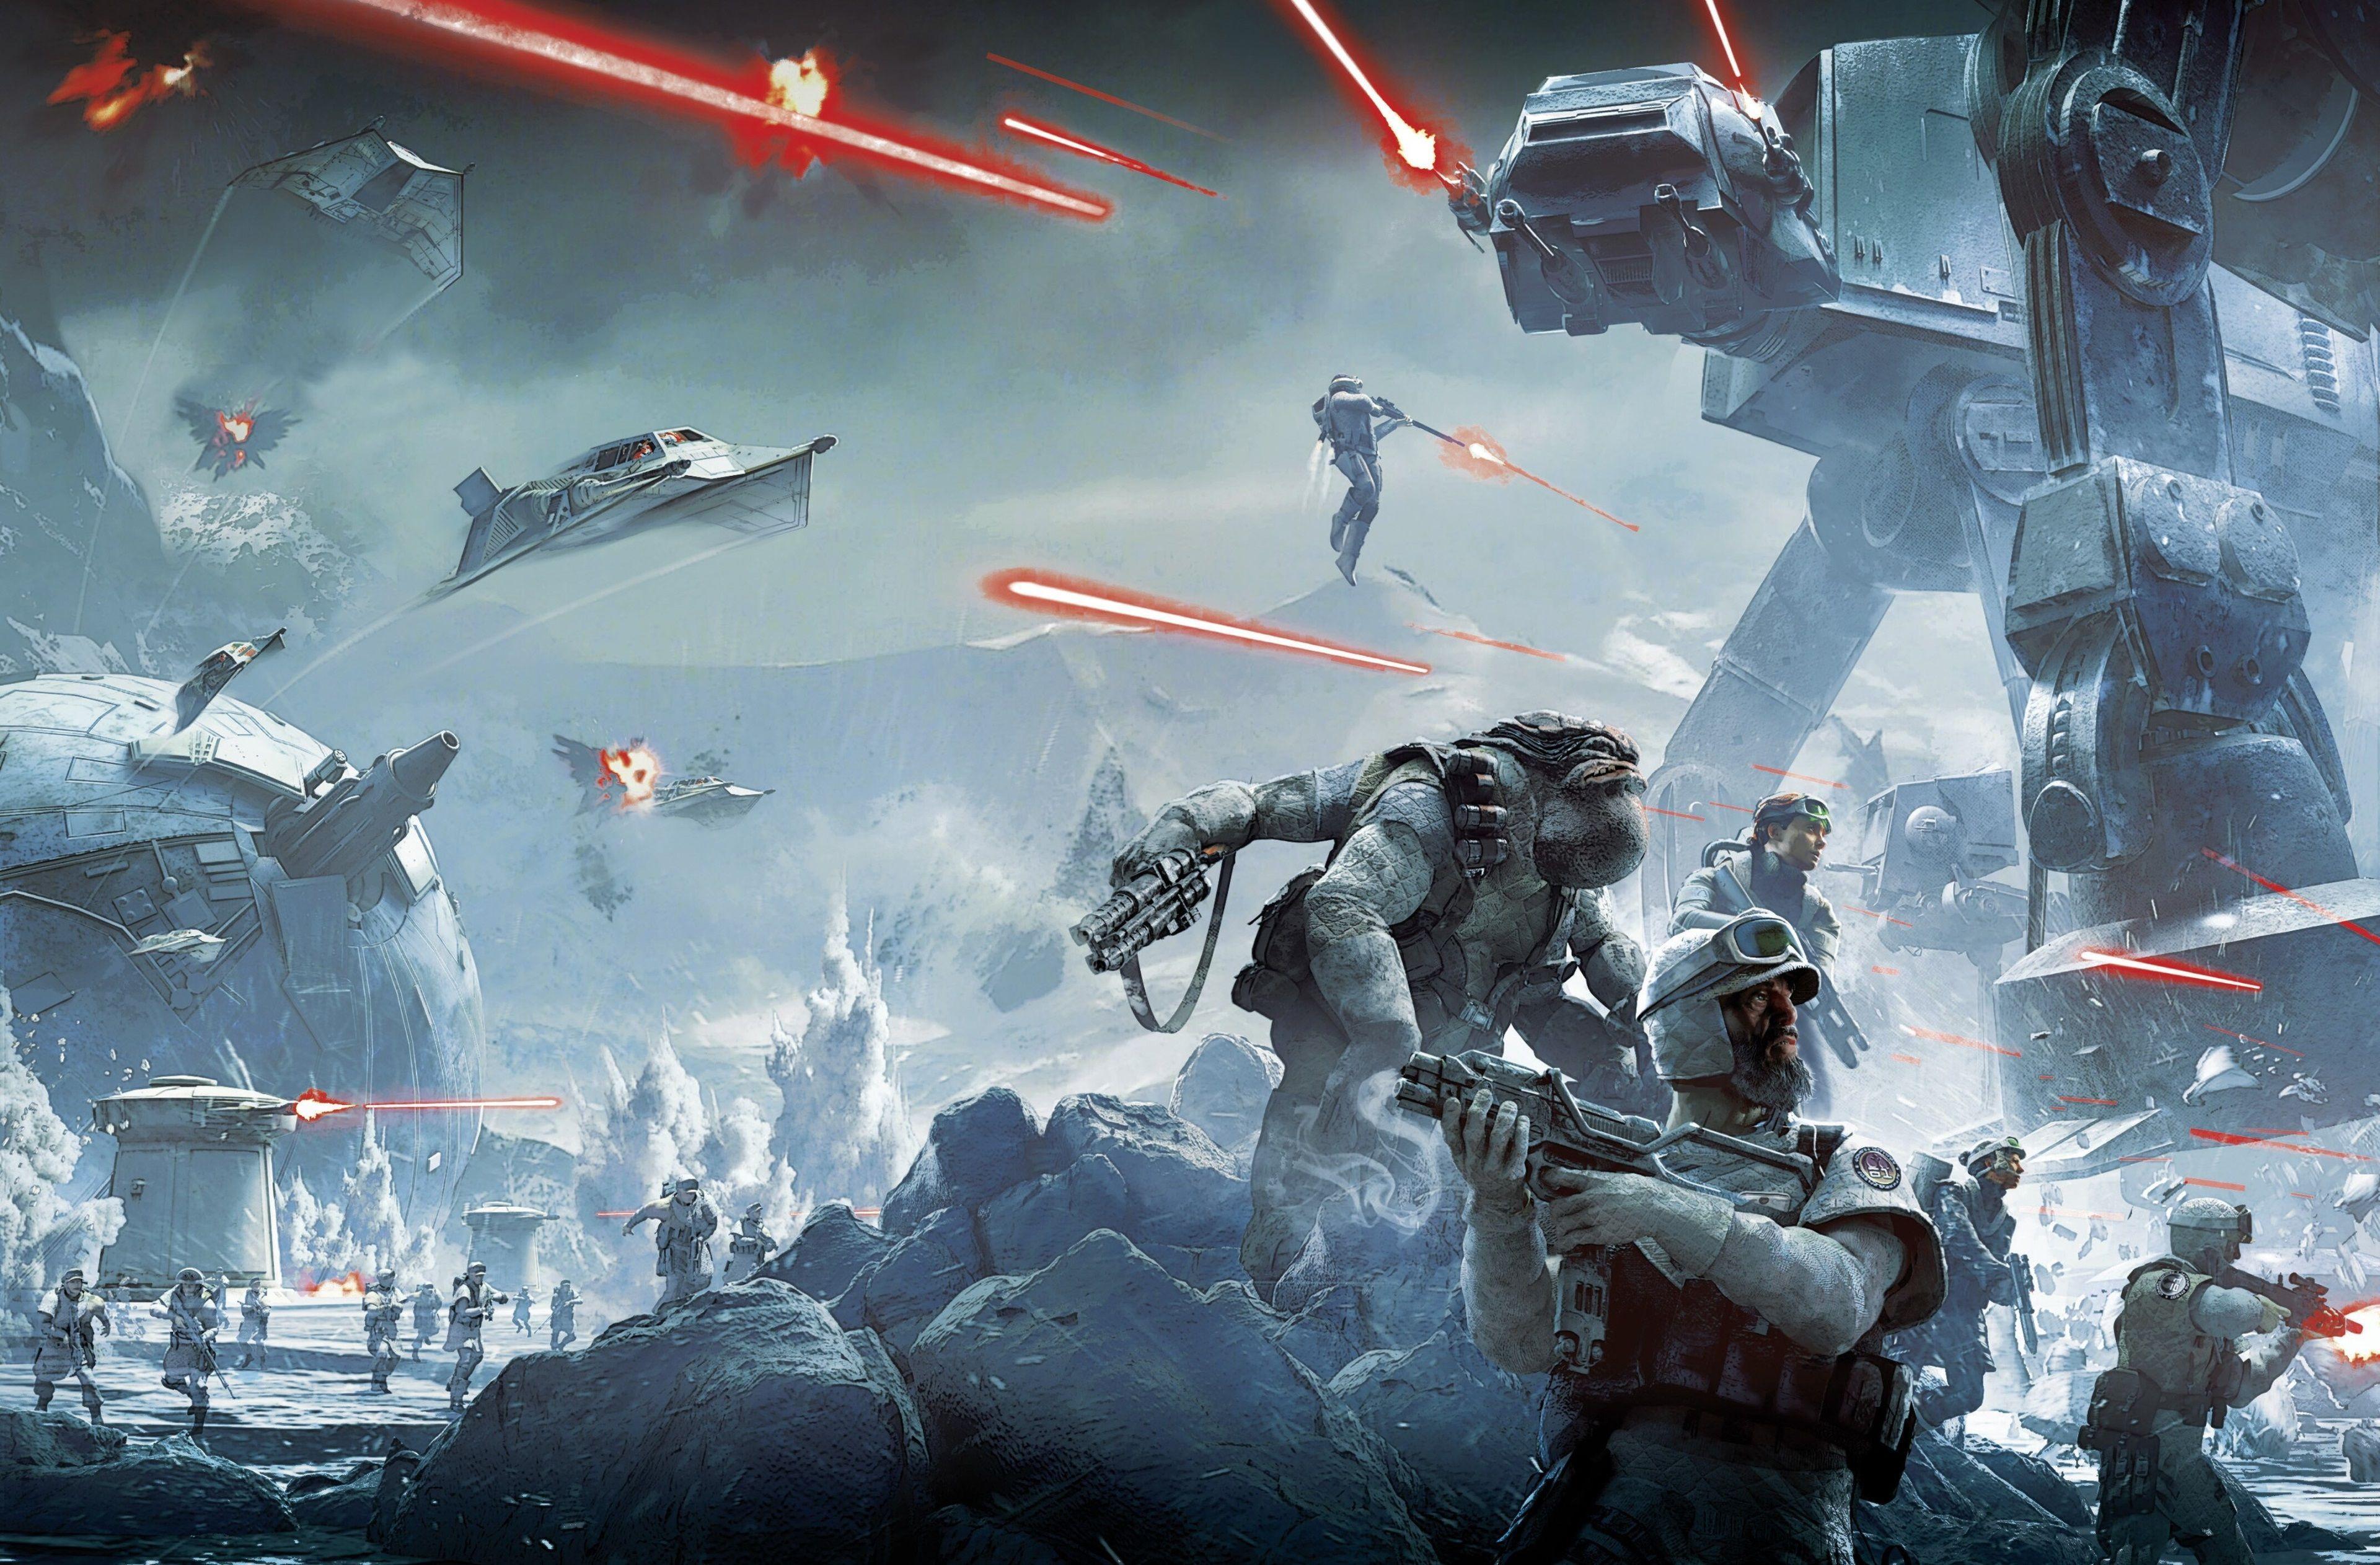 Star Wars Desktop Wallpapers Top Free Star Wars Desktop